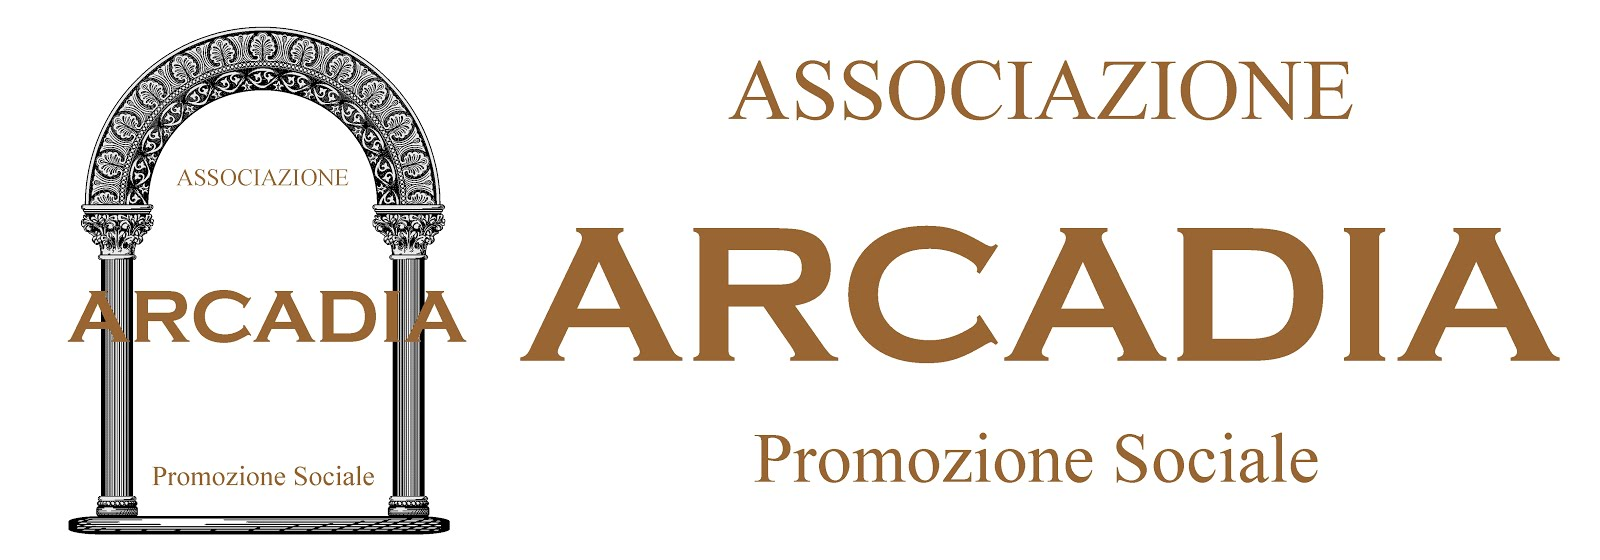 - ASSOCIAZIONE ARCADIA -